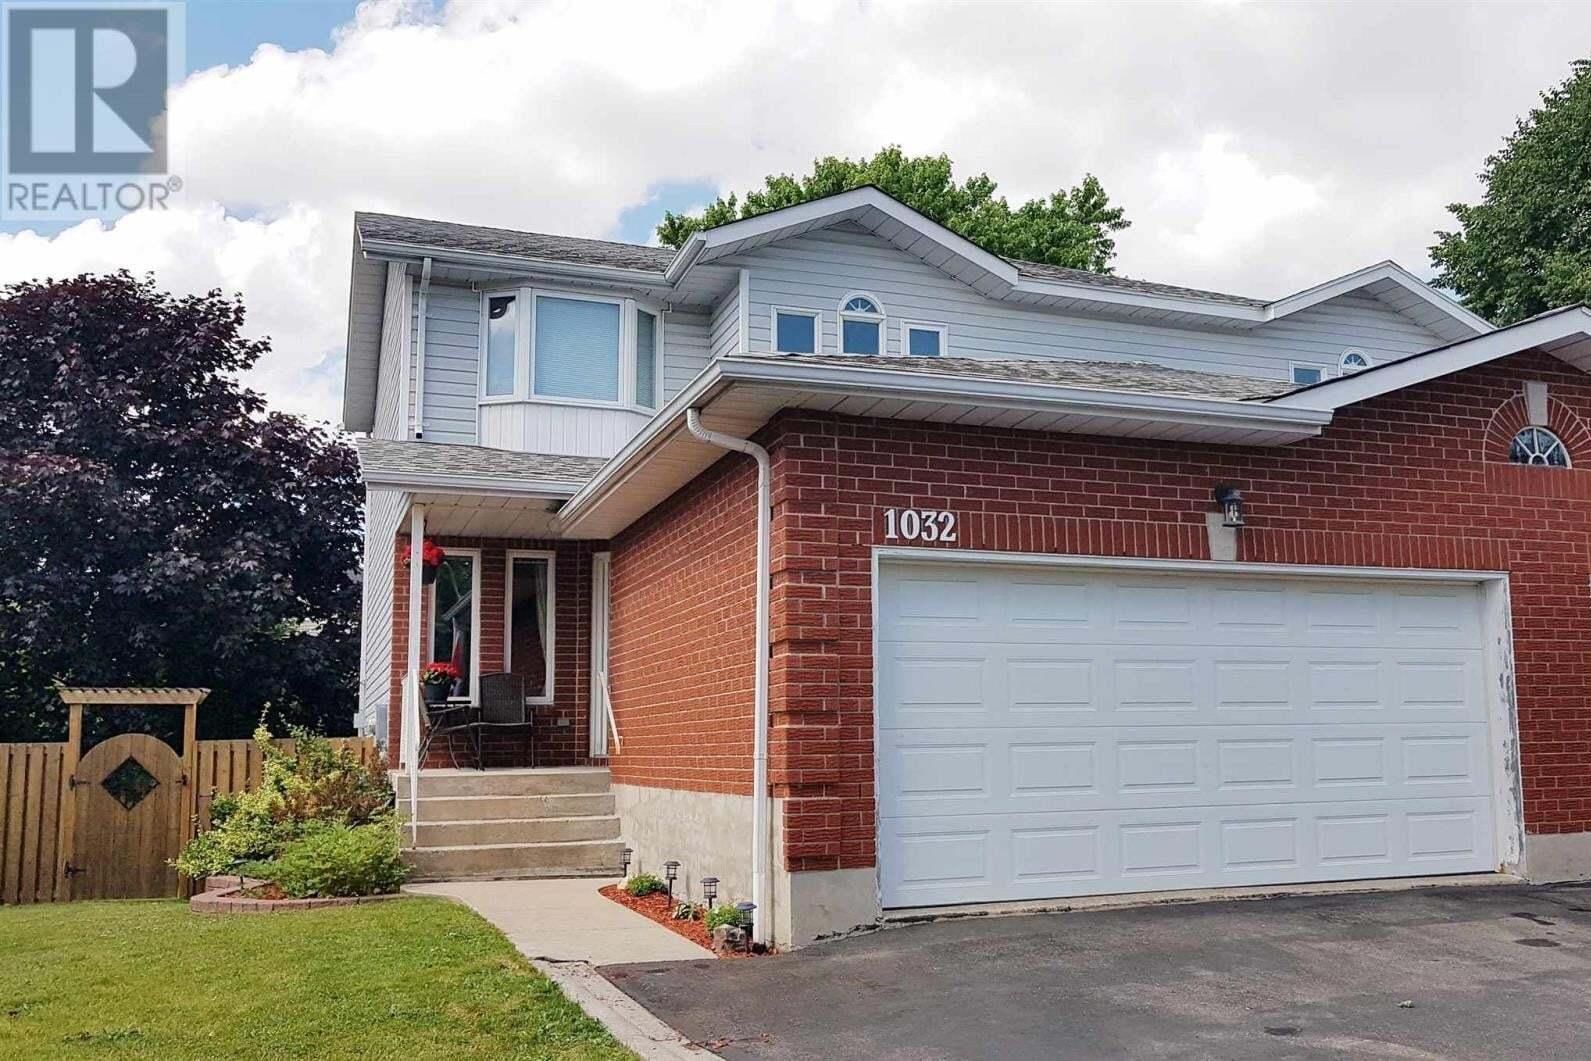 House for sale at 1032 Waterbury Cres Kingston Ontario - MLS: K20003520